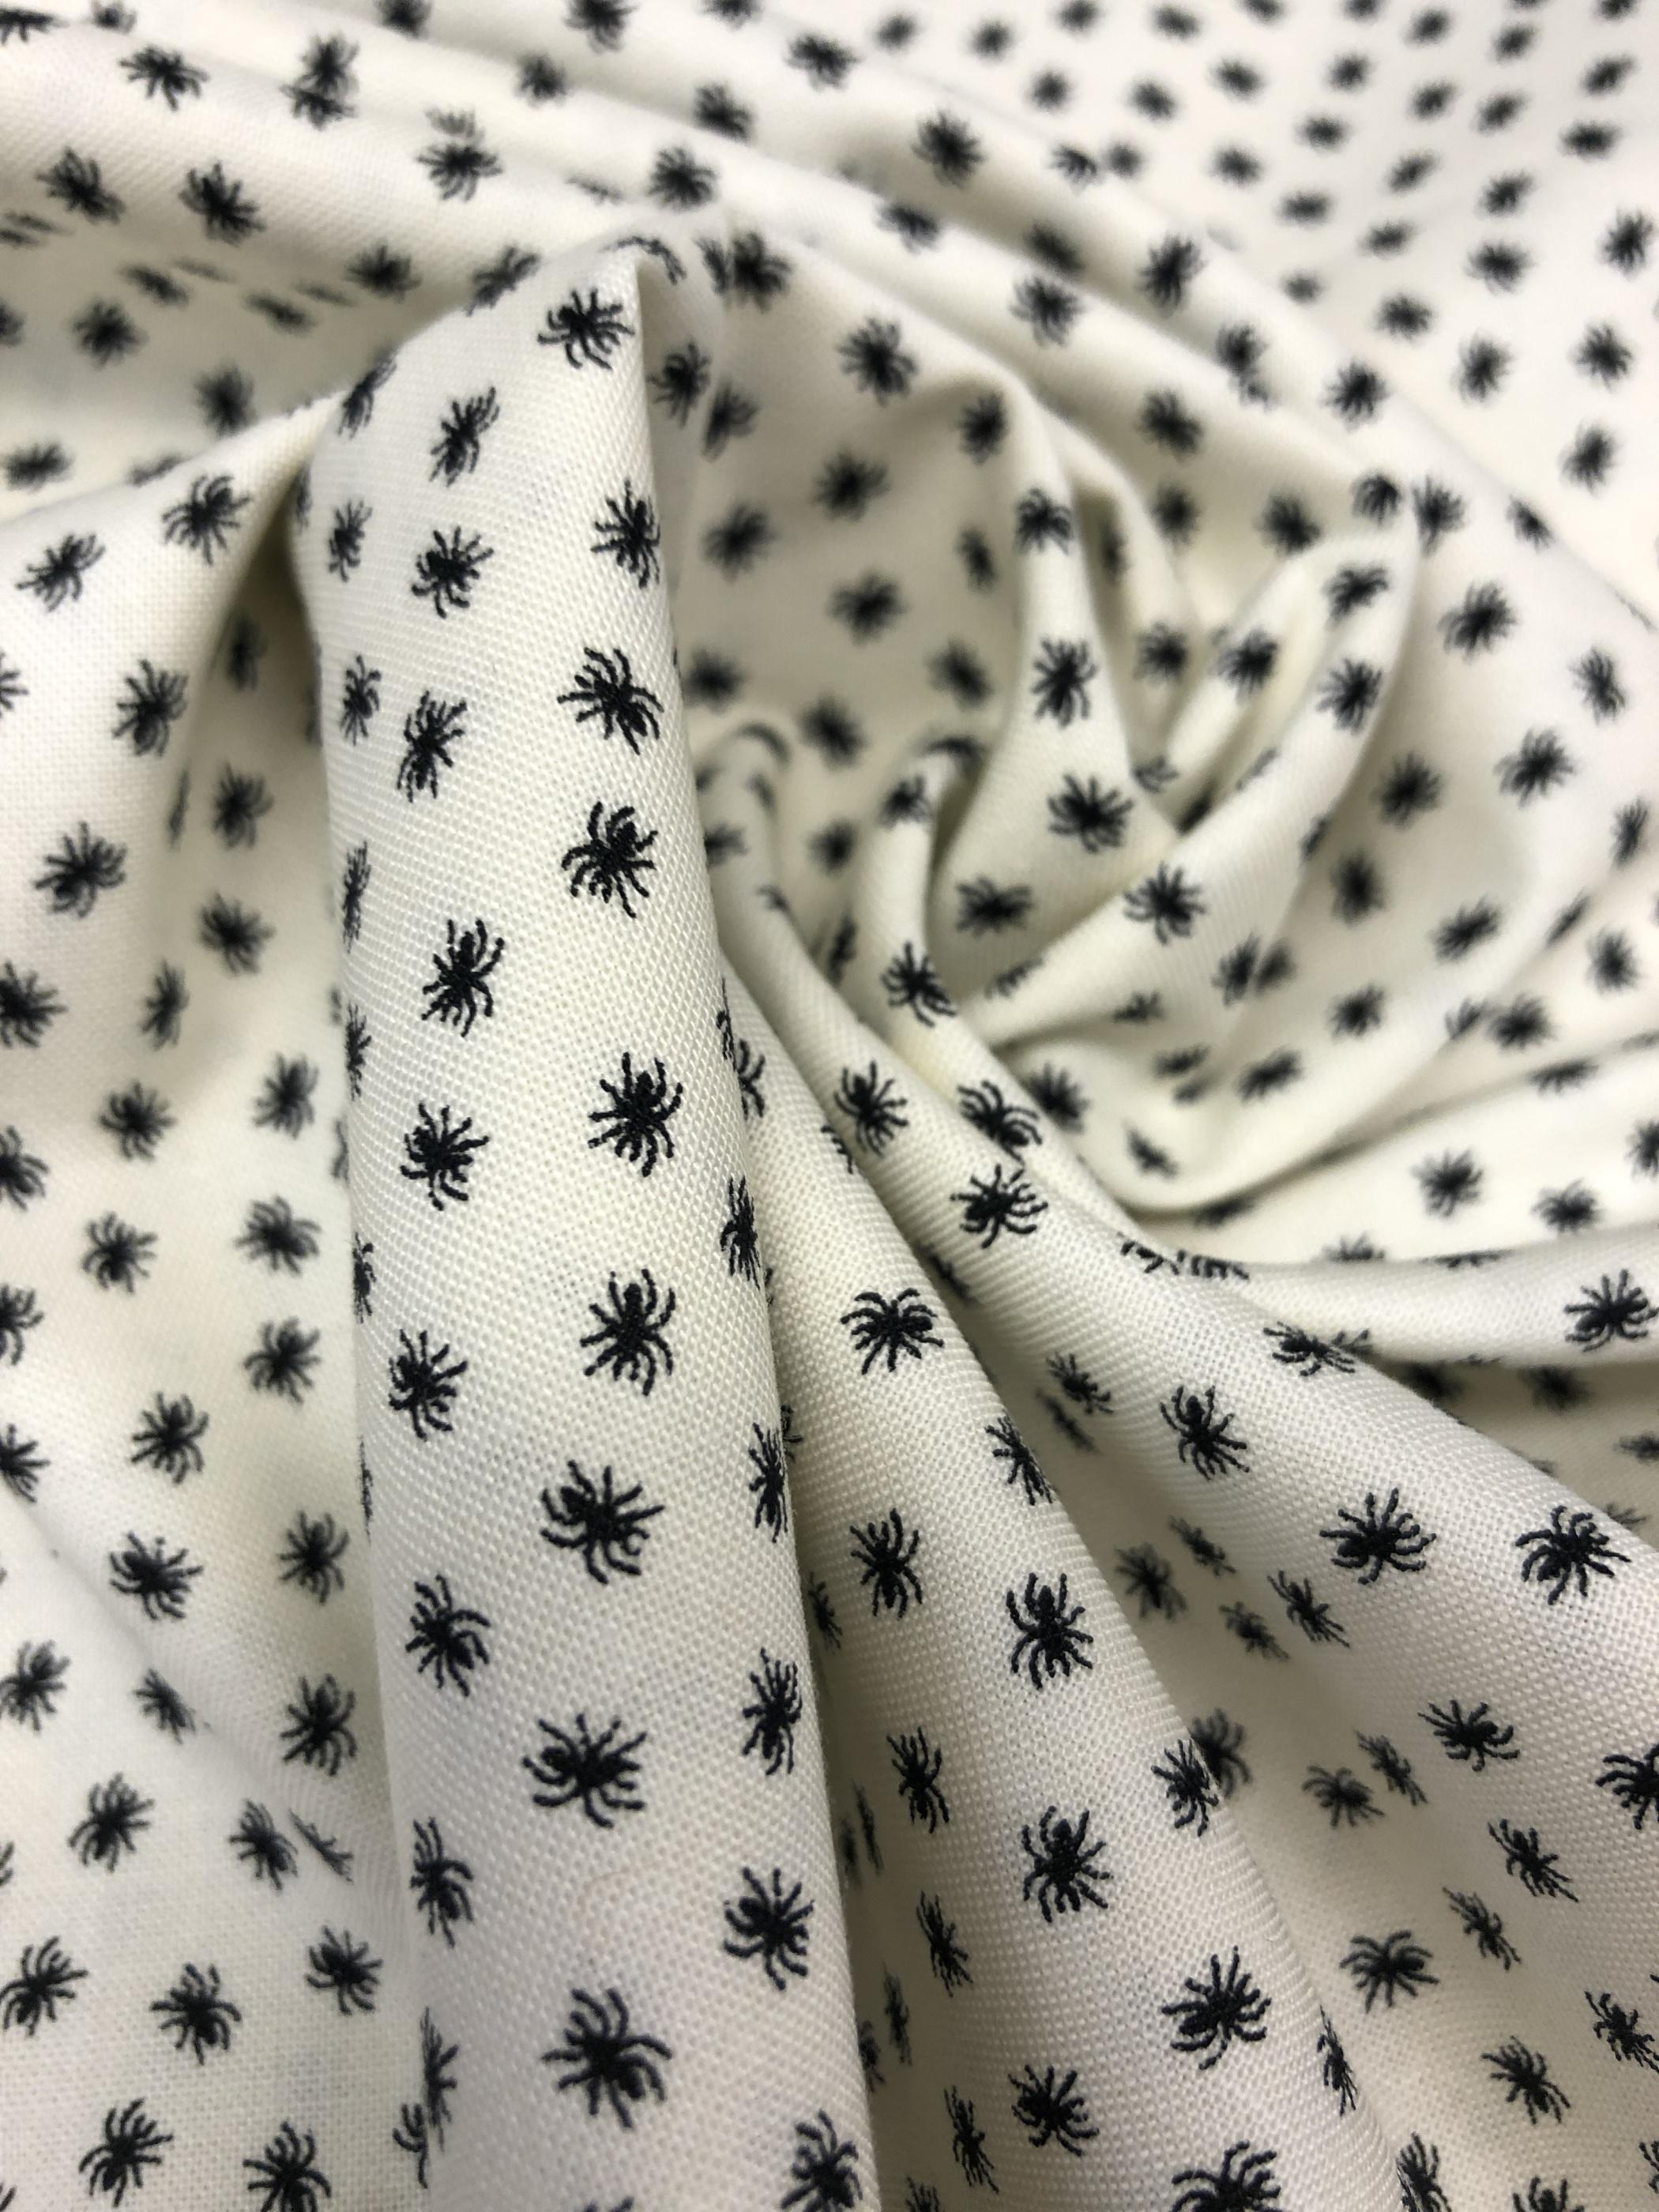 Spindlar halloween bomull modetyg tyglust laholm